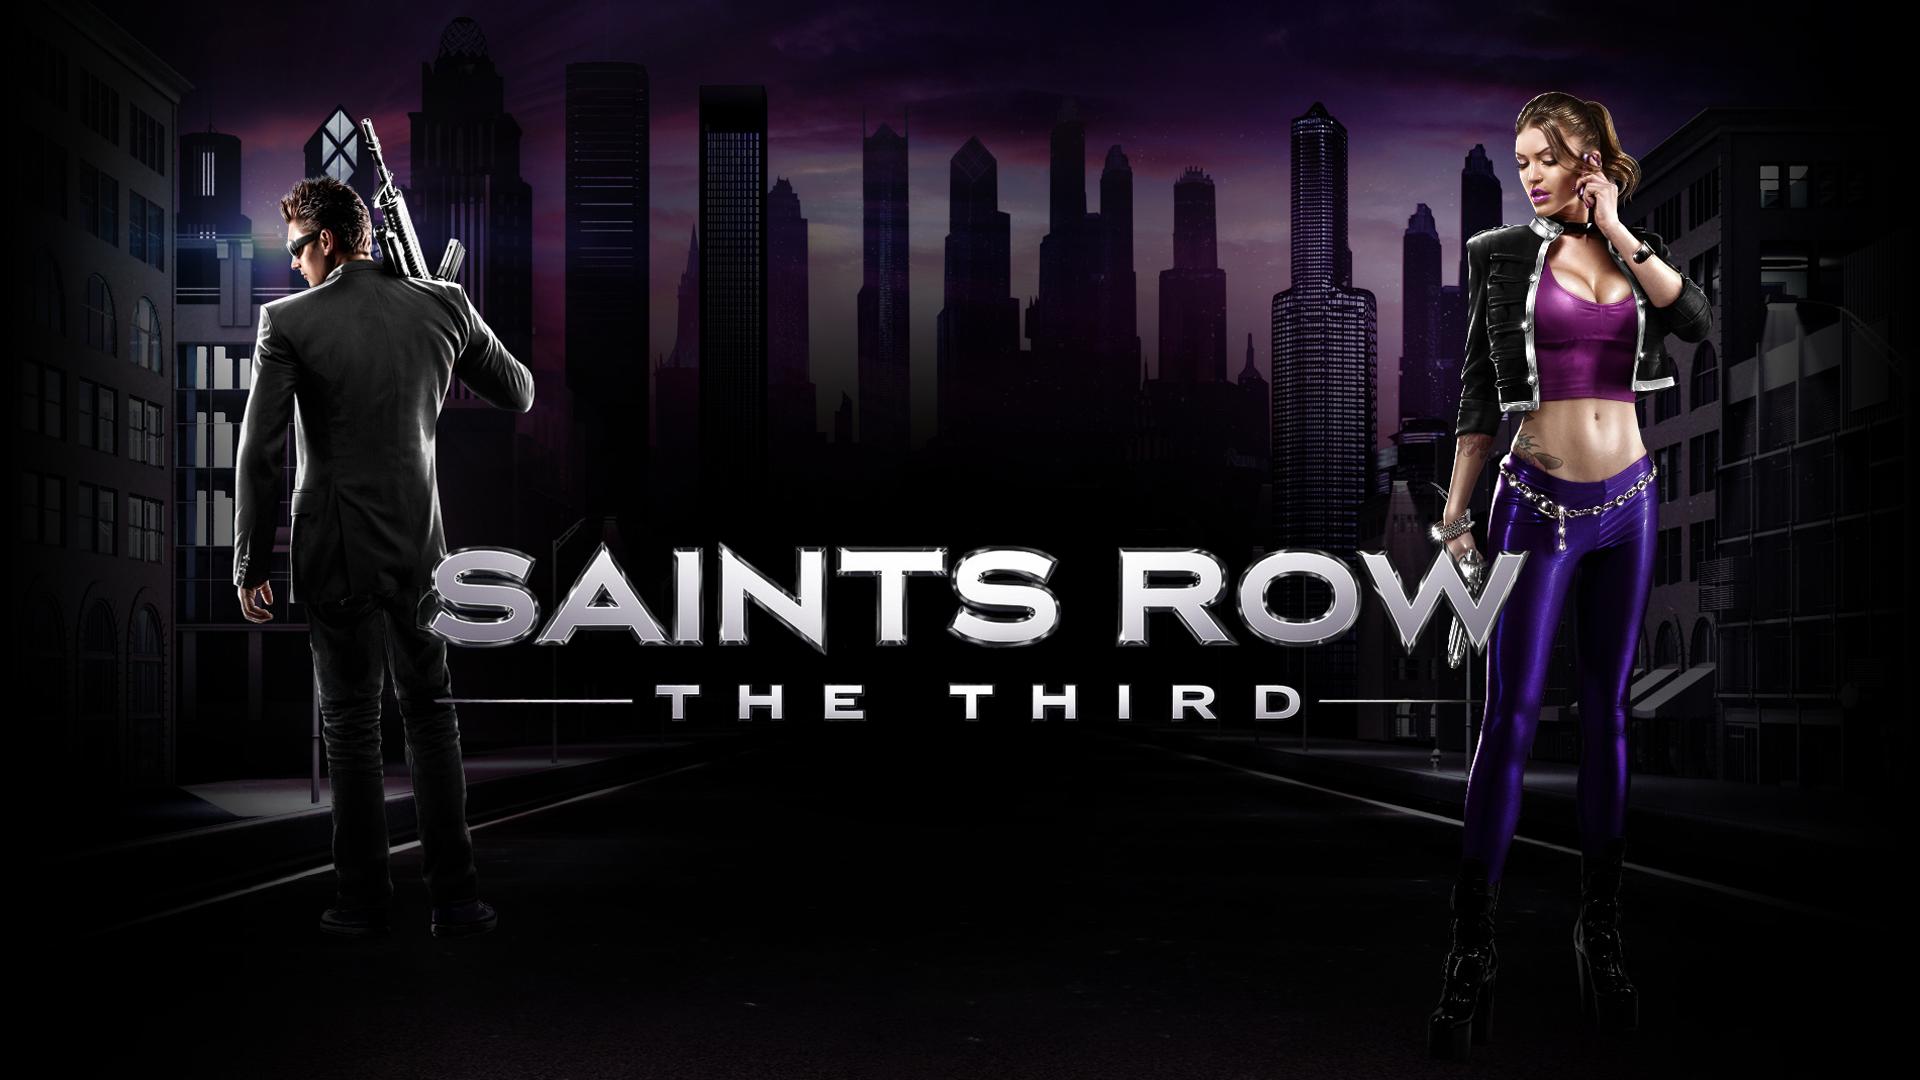 <b>Saints Row 3 Cheat Codes</b>, <b>Unlockables</b>, Hacks For More Guns ...